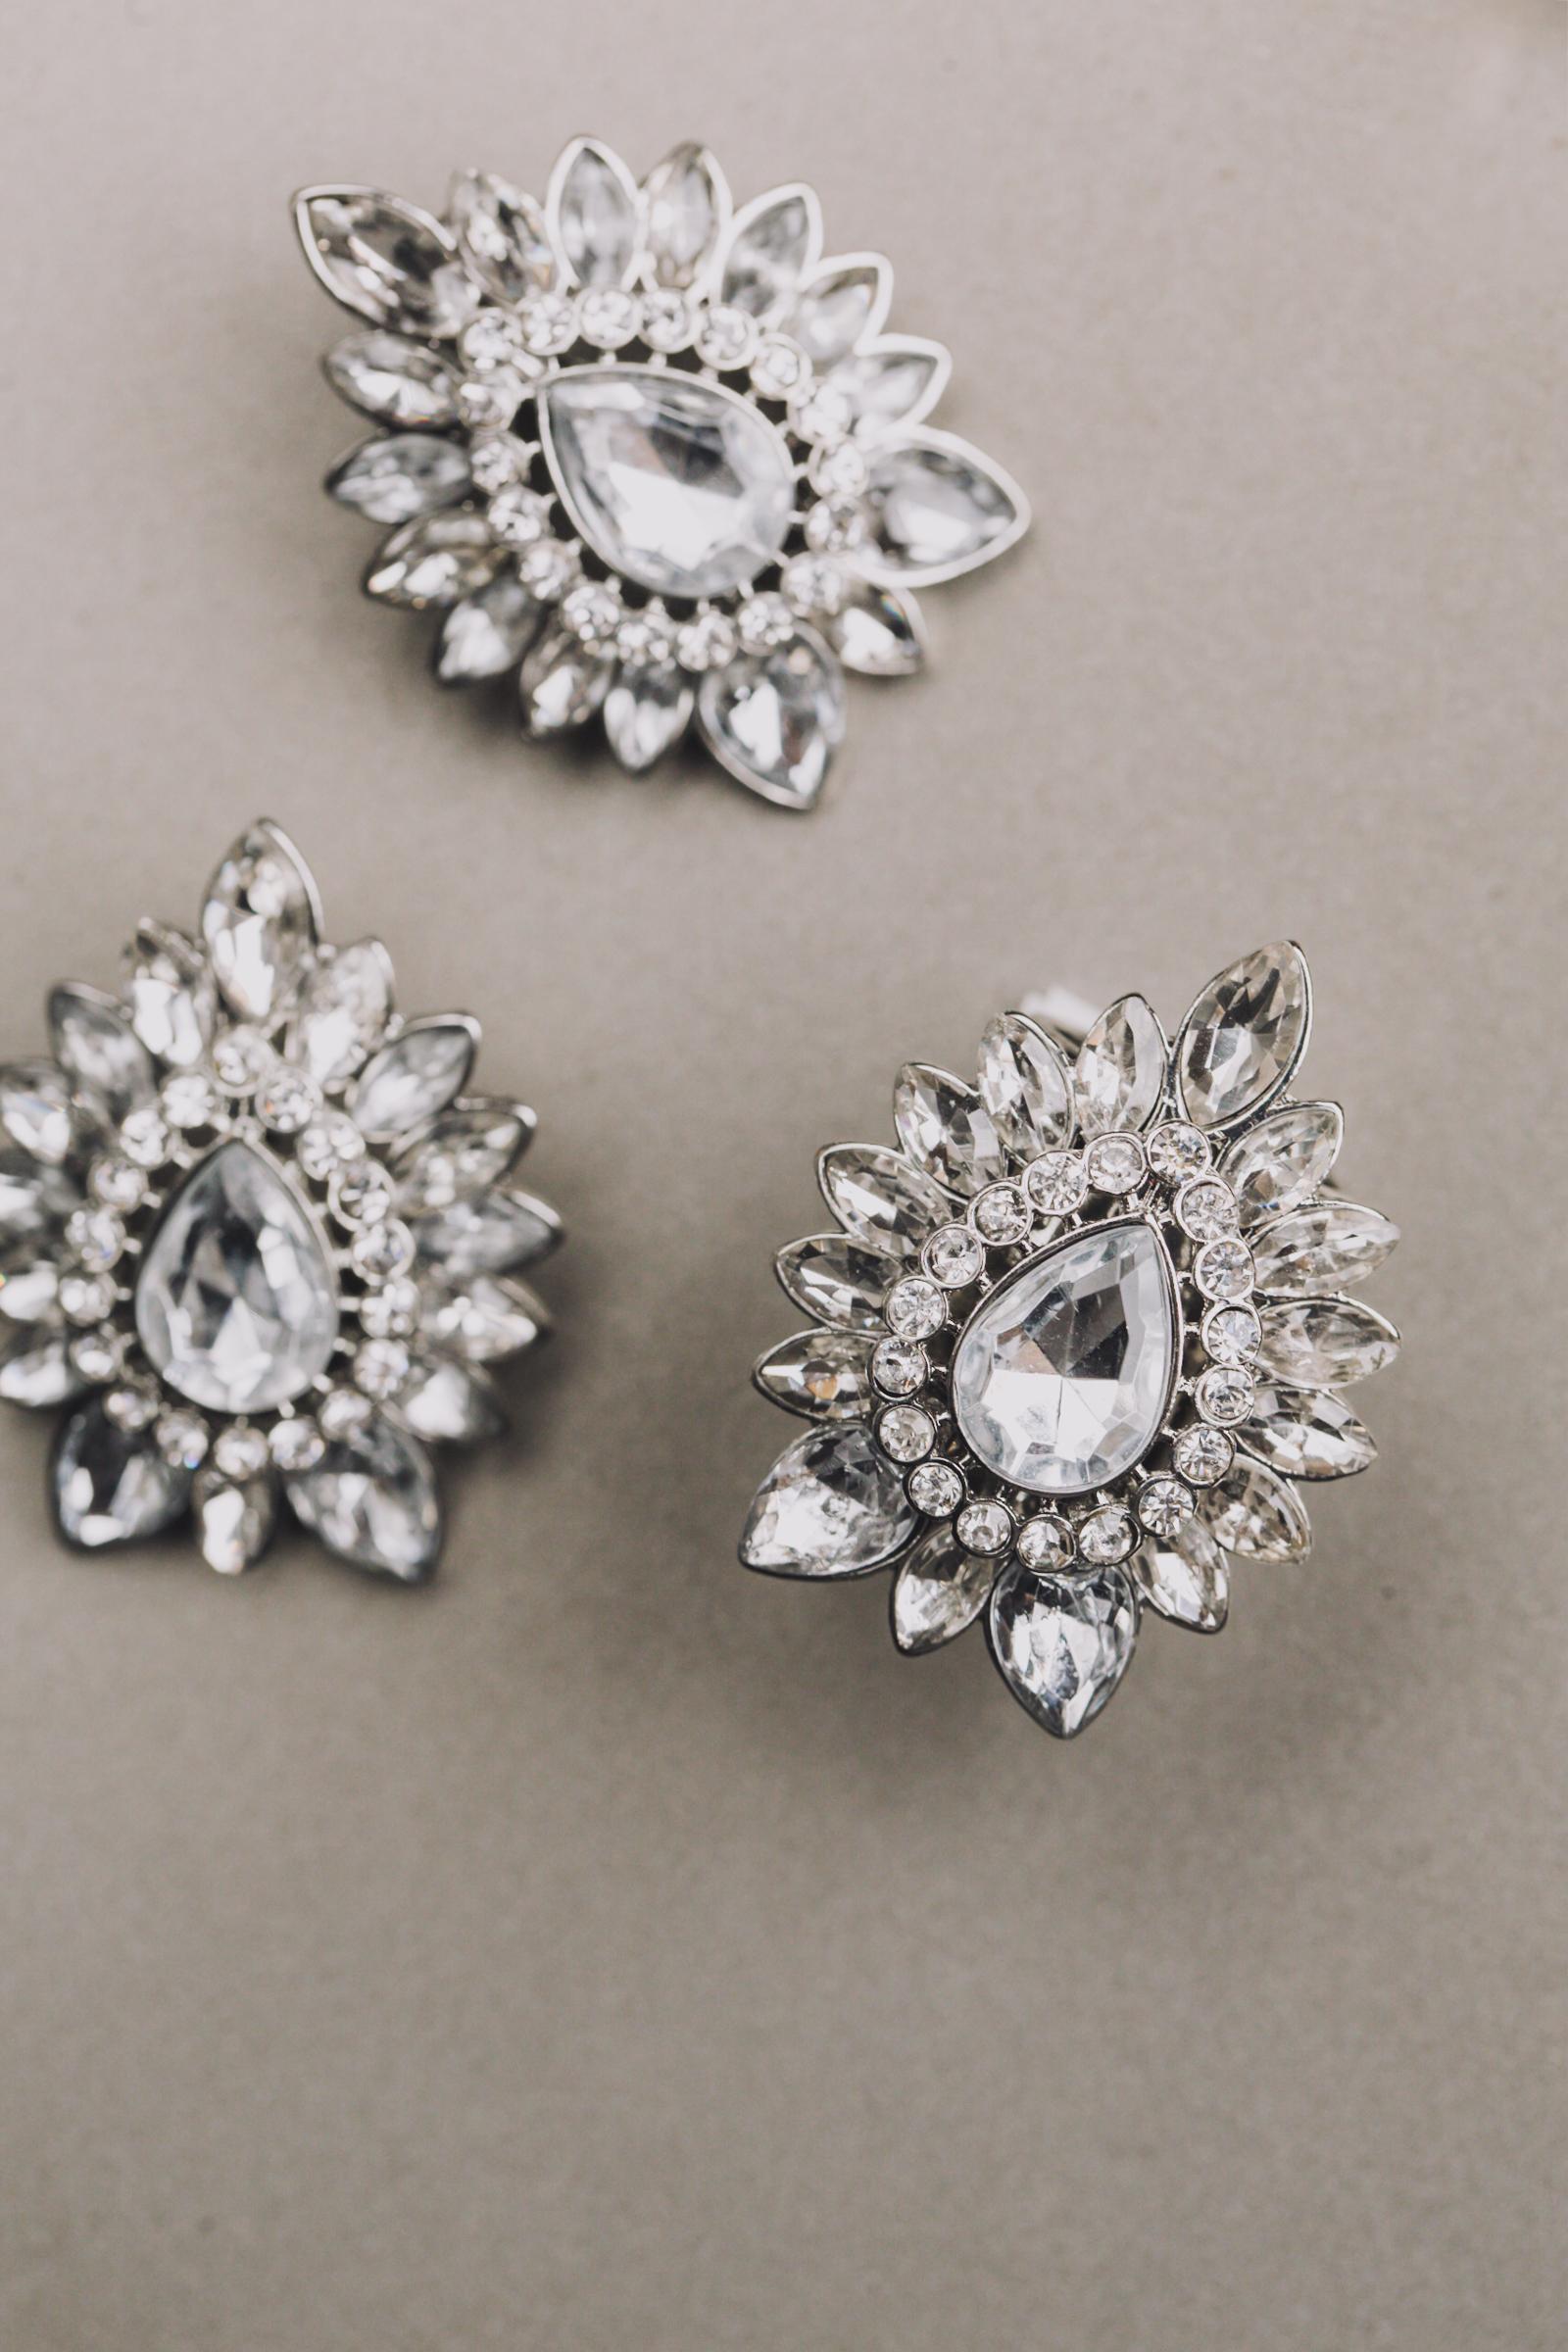 20150320-001-floral_crown_fashion_editorial.jpg